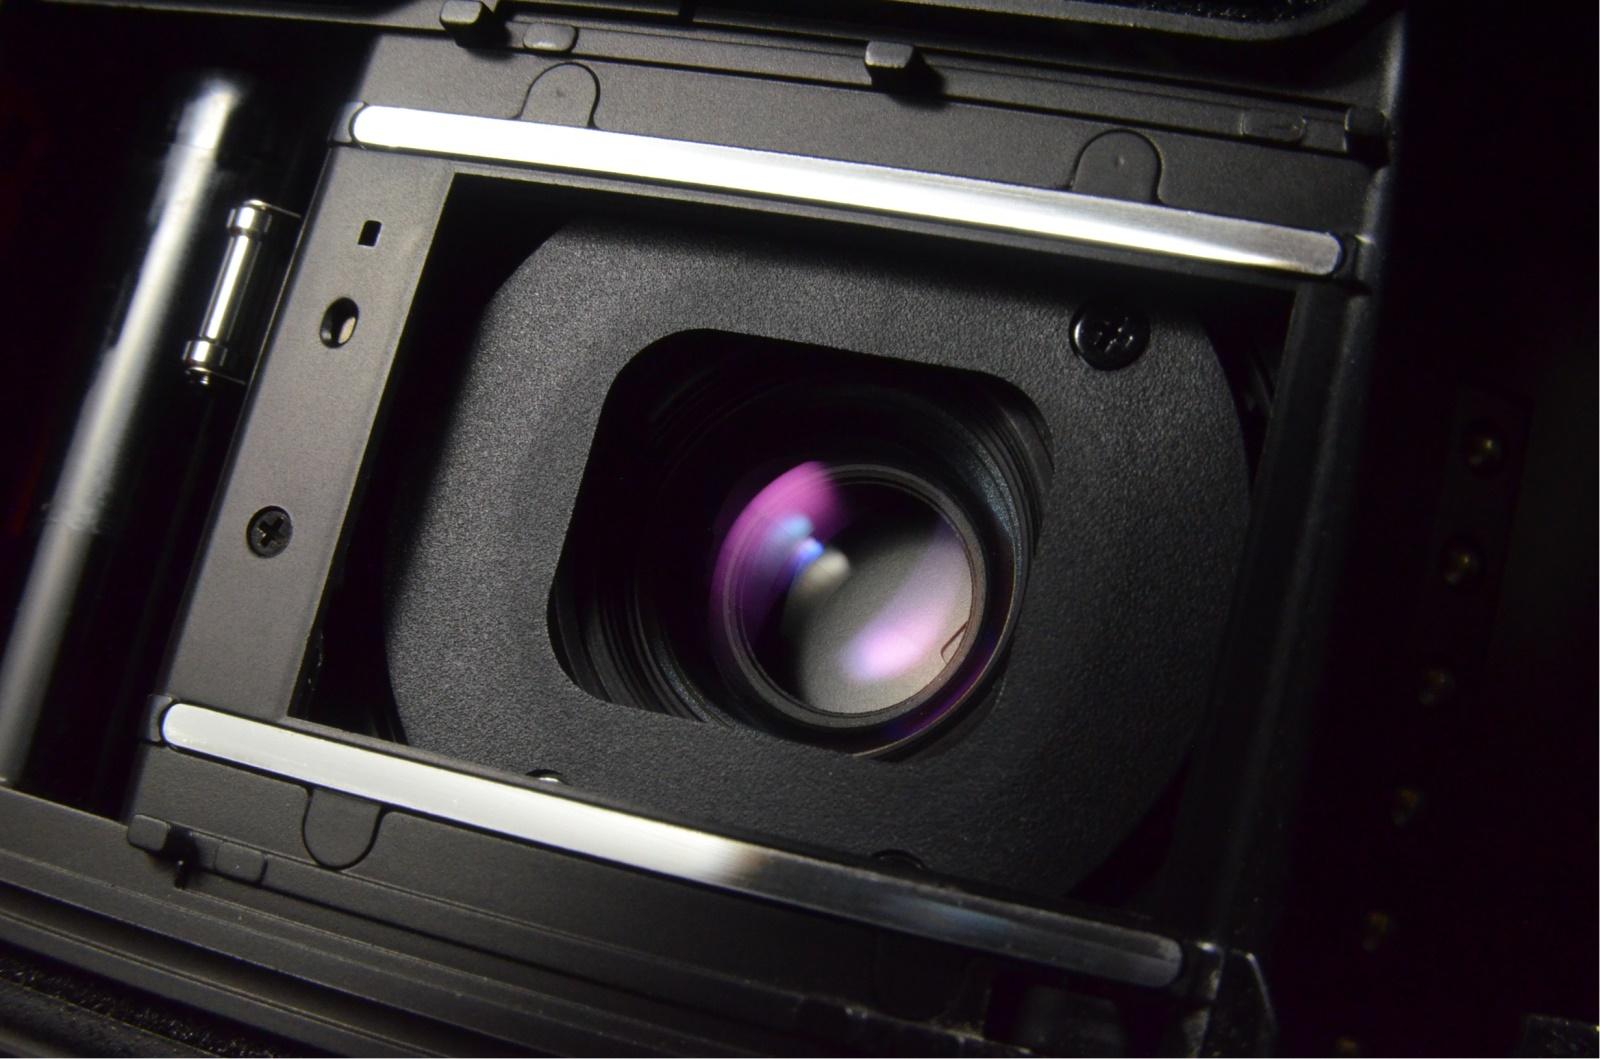 nikon 28ti p&s 35mm film camera lens 28mm f2.8 film tested